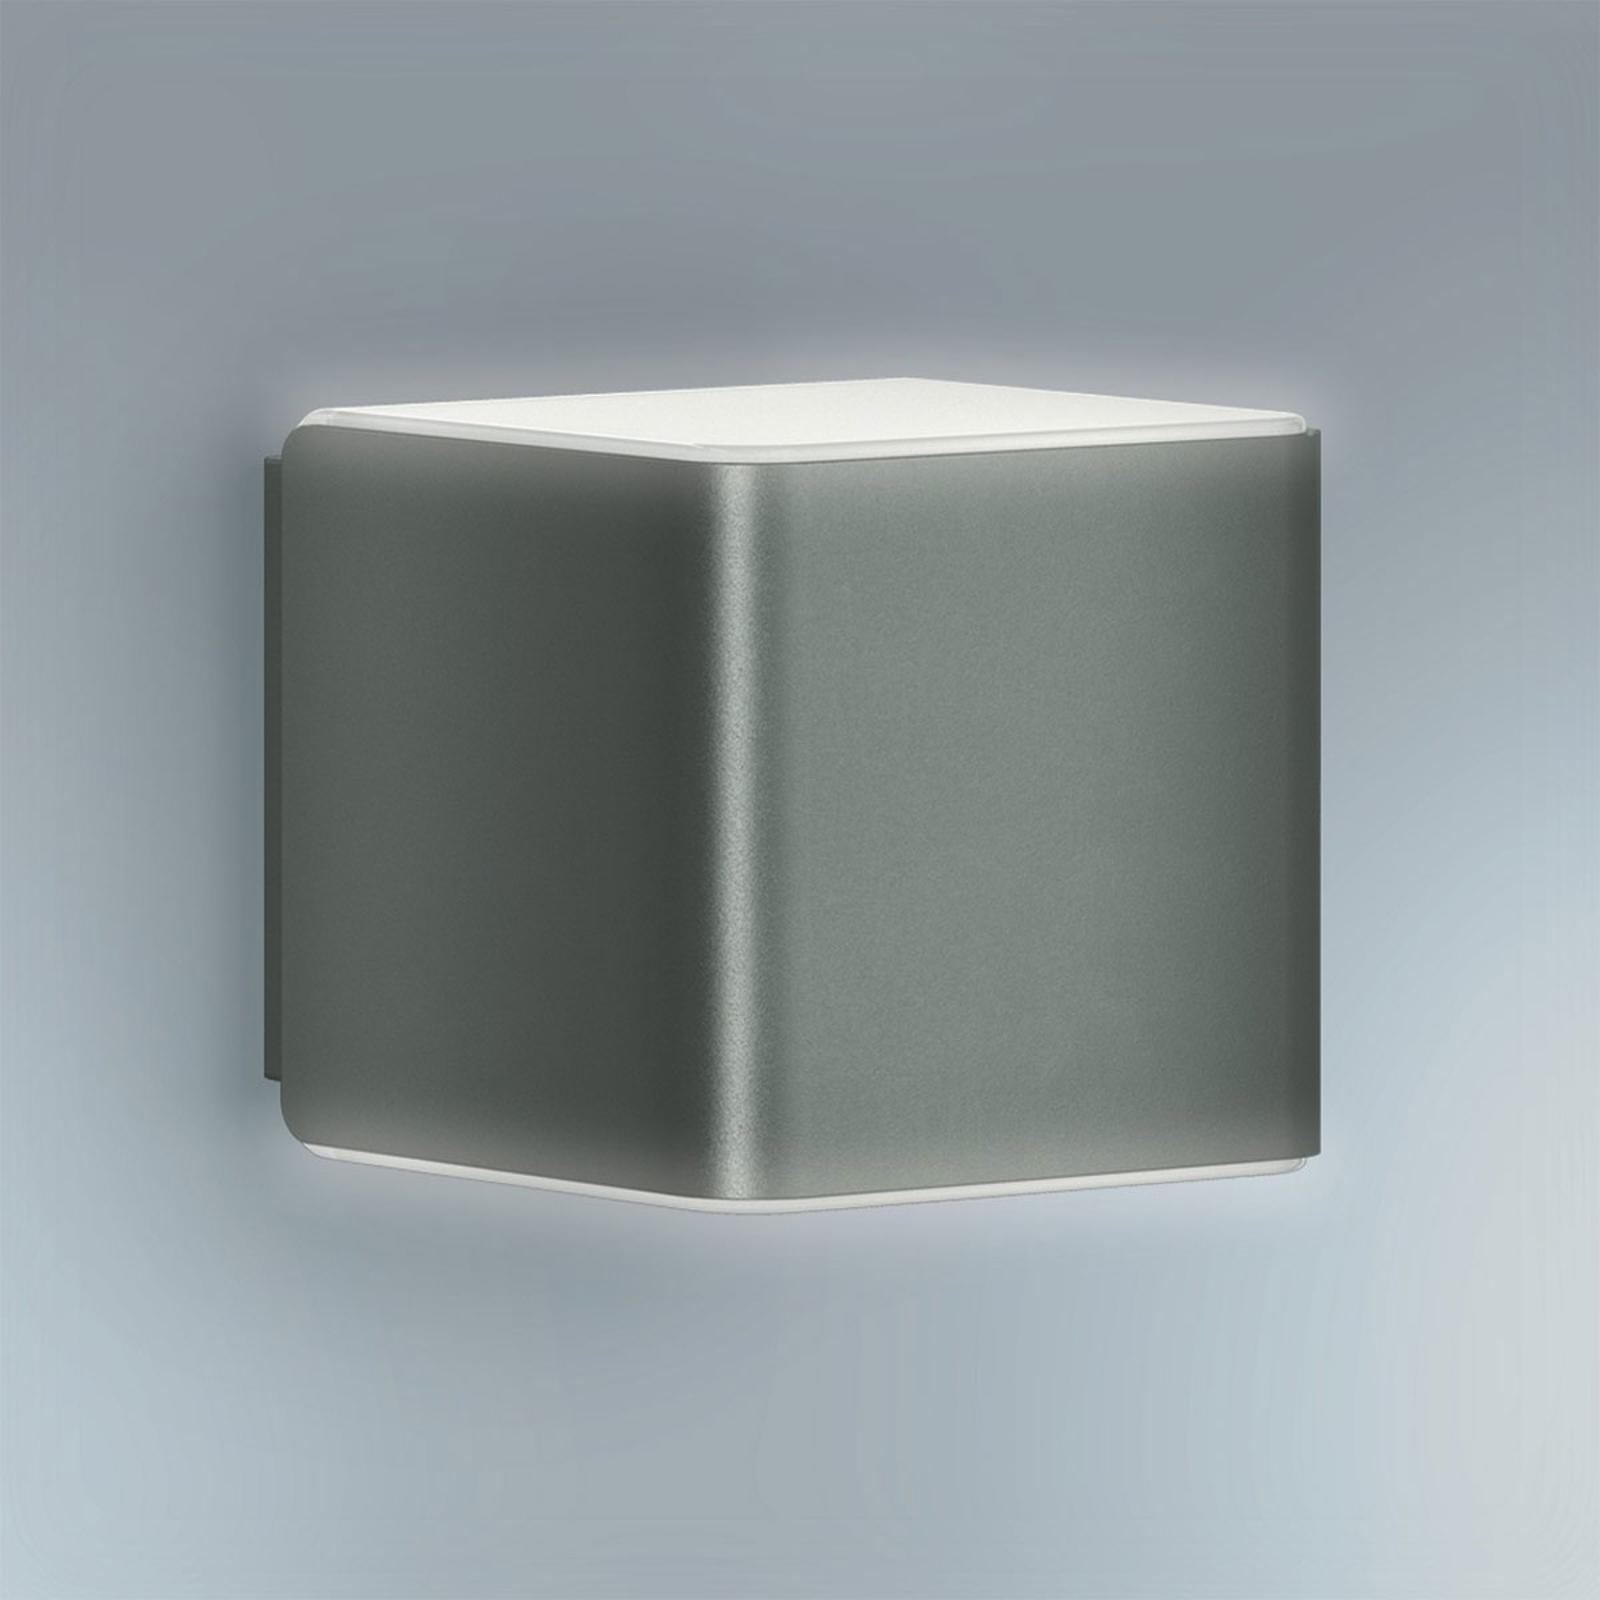 STEINEL L 840 LED iHF vegglampe, antrasitt